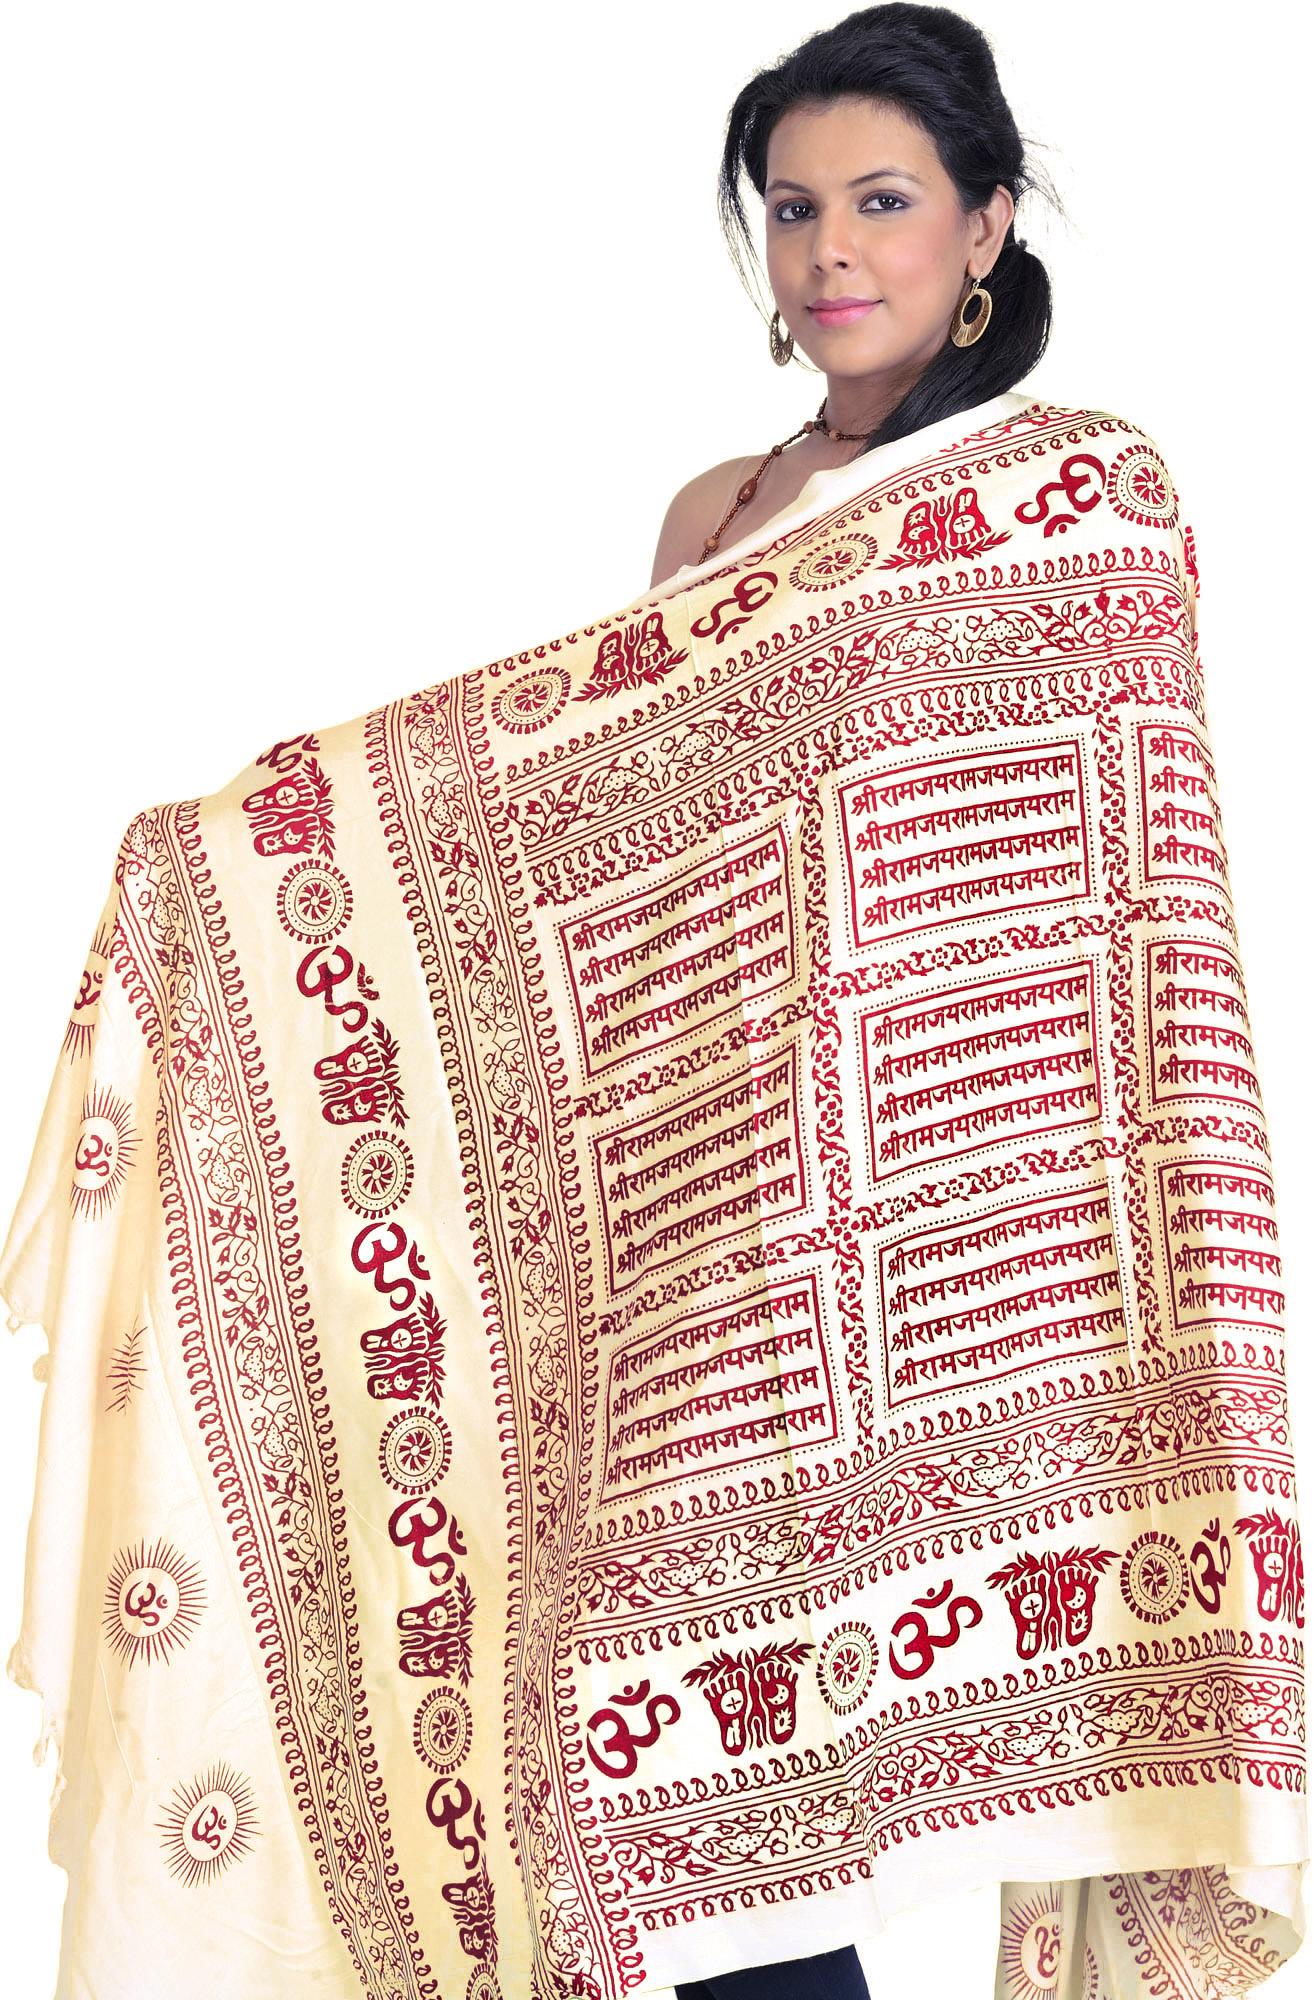 Religious Clothes & Accessories like Jholas, Prayer Shawls & Kurtis